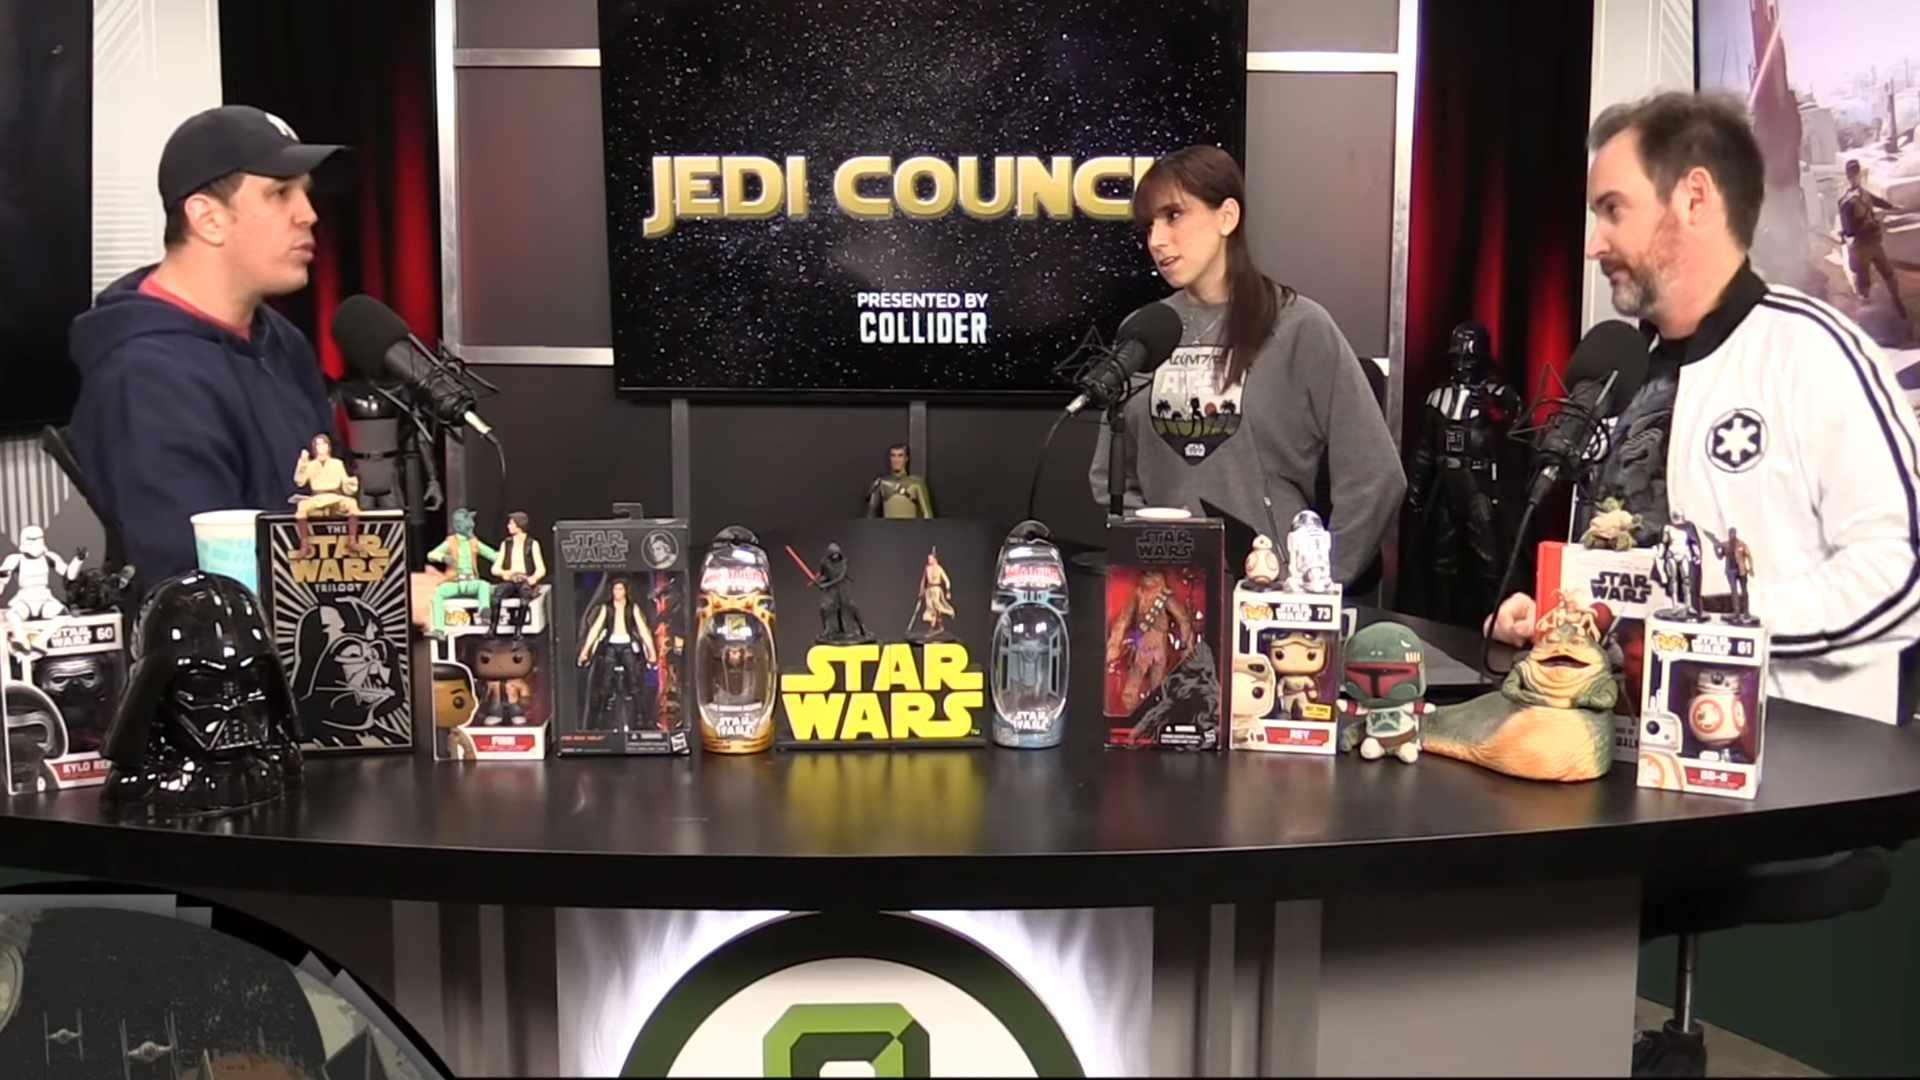 Collider Jedi Council Star Wars news podcast